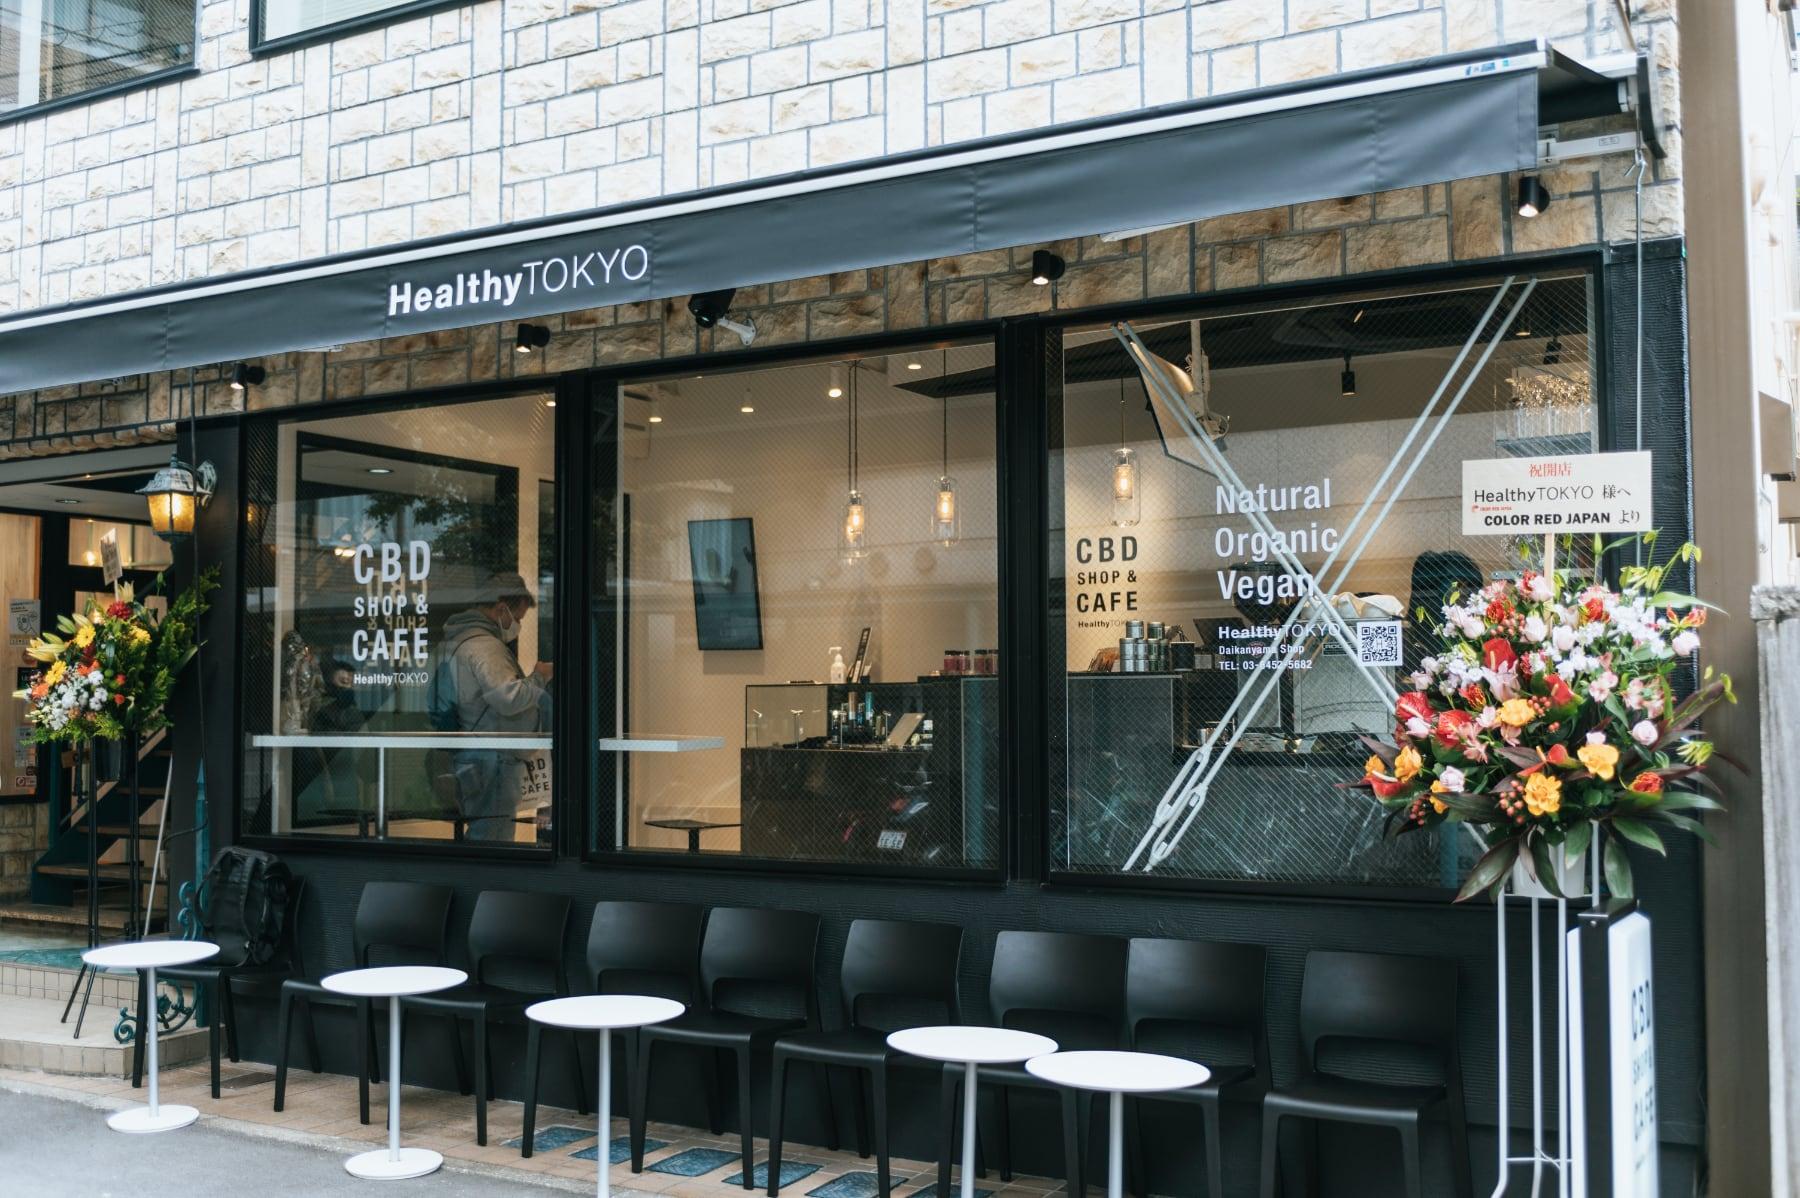 HealthyTOKYO CBD Shop and Cafe Daikanyama